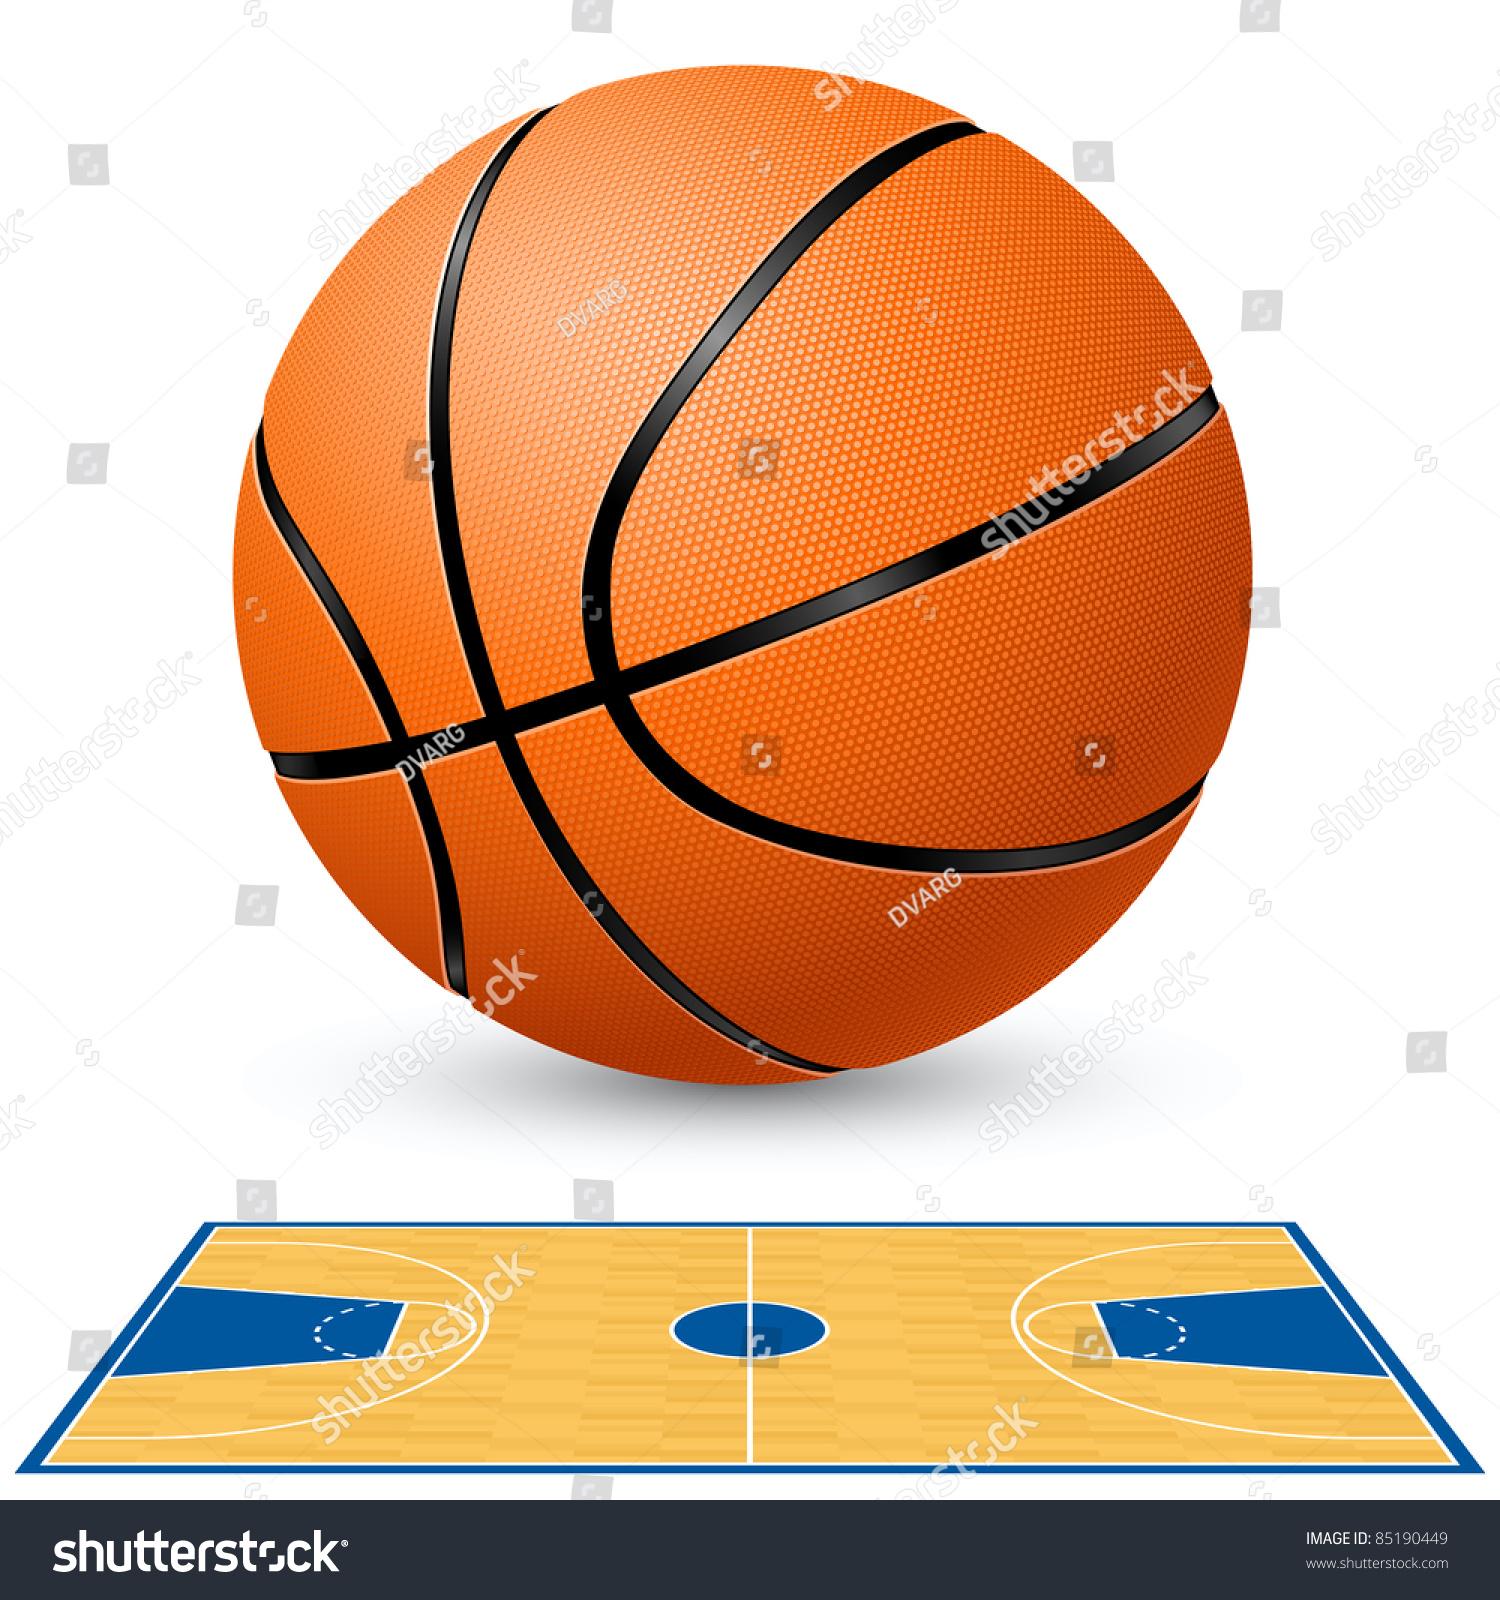 Basketball basketball court floor plan illustration stock for Basketball floor layout